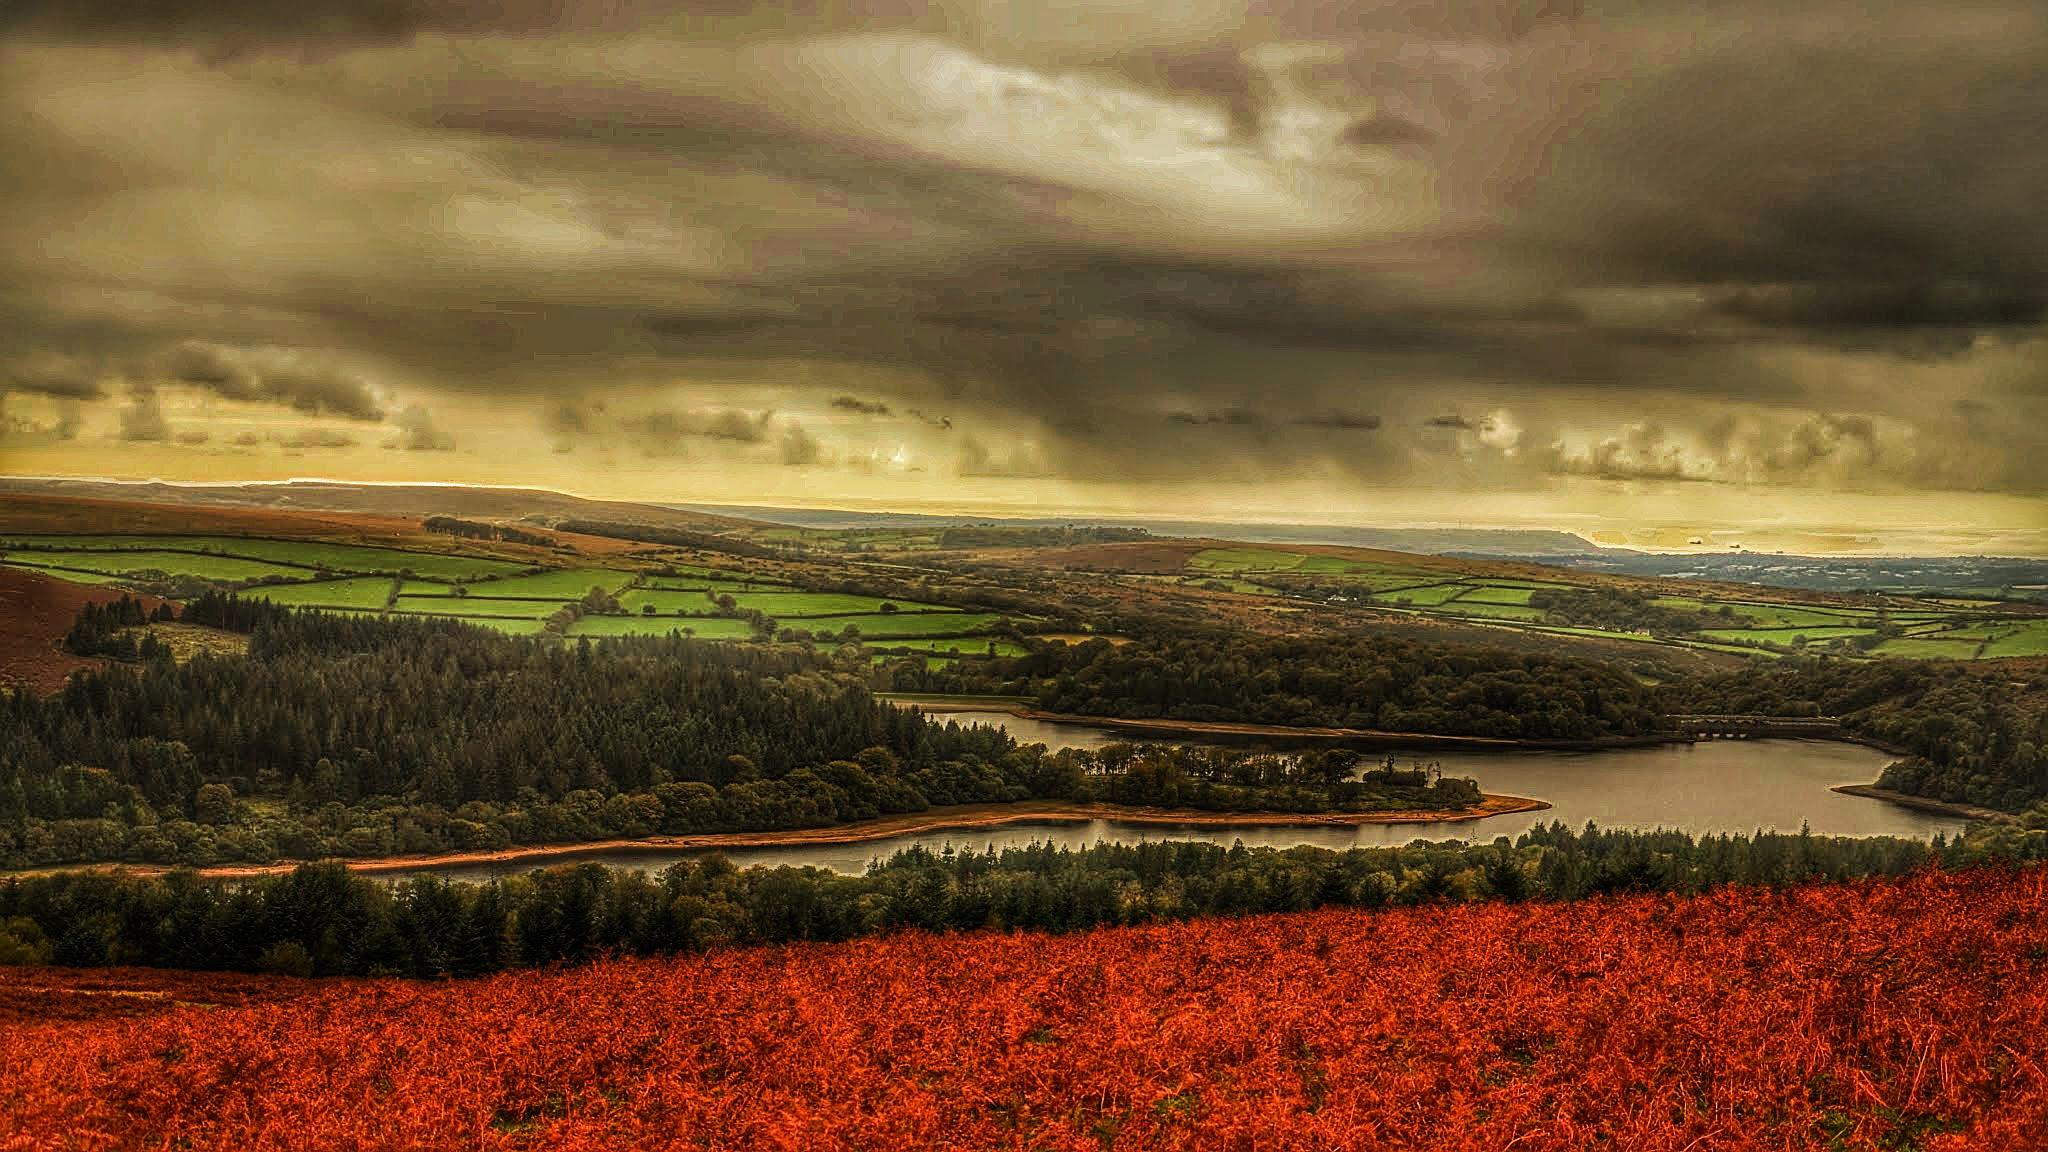 Autumn on Dartmoor by johncedriccoles123